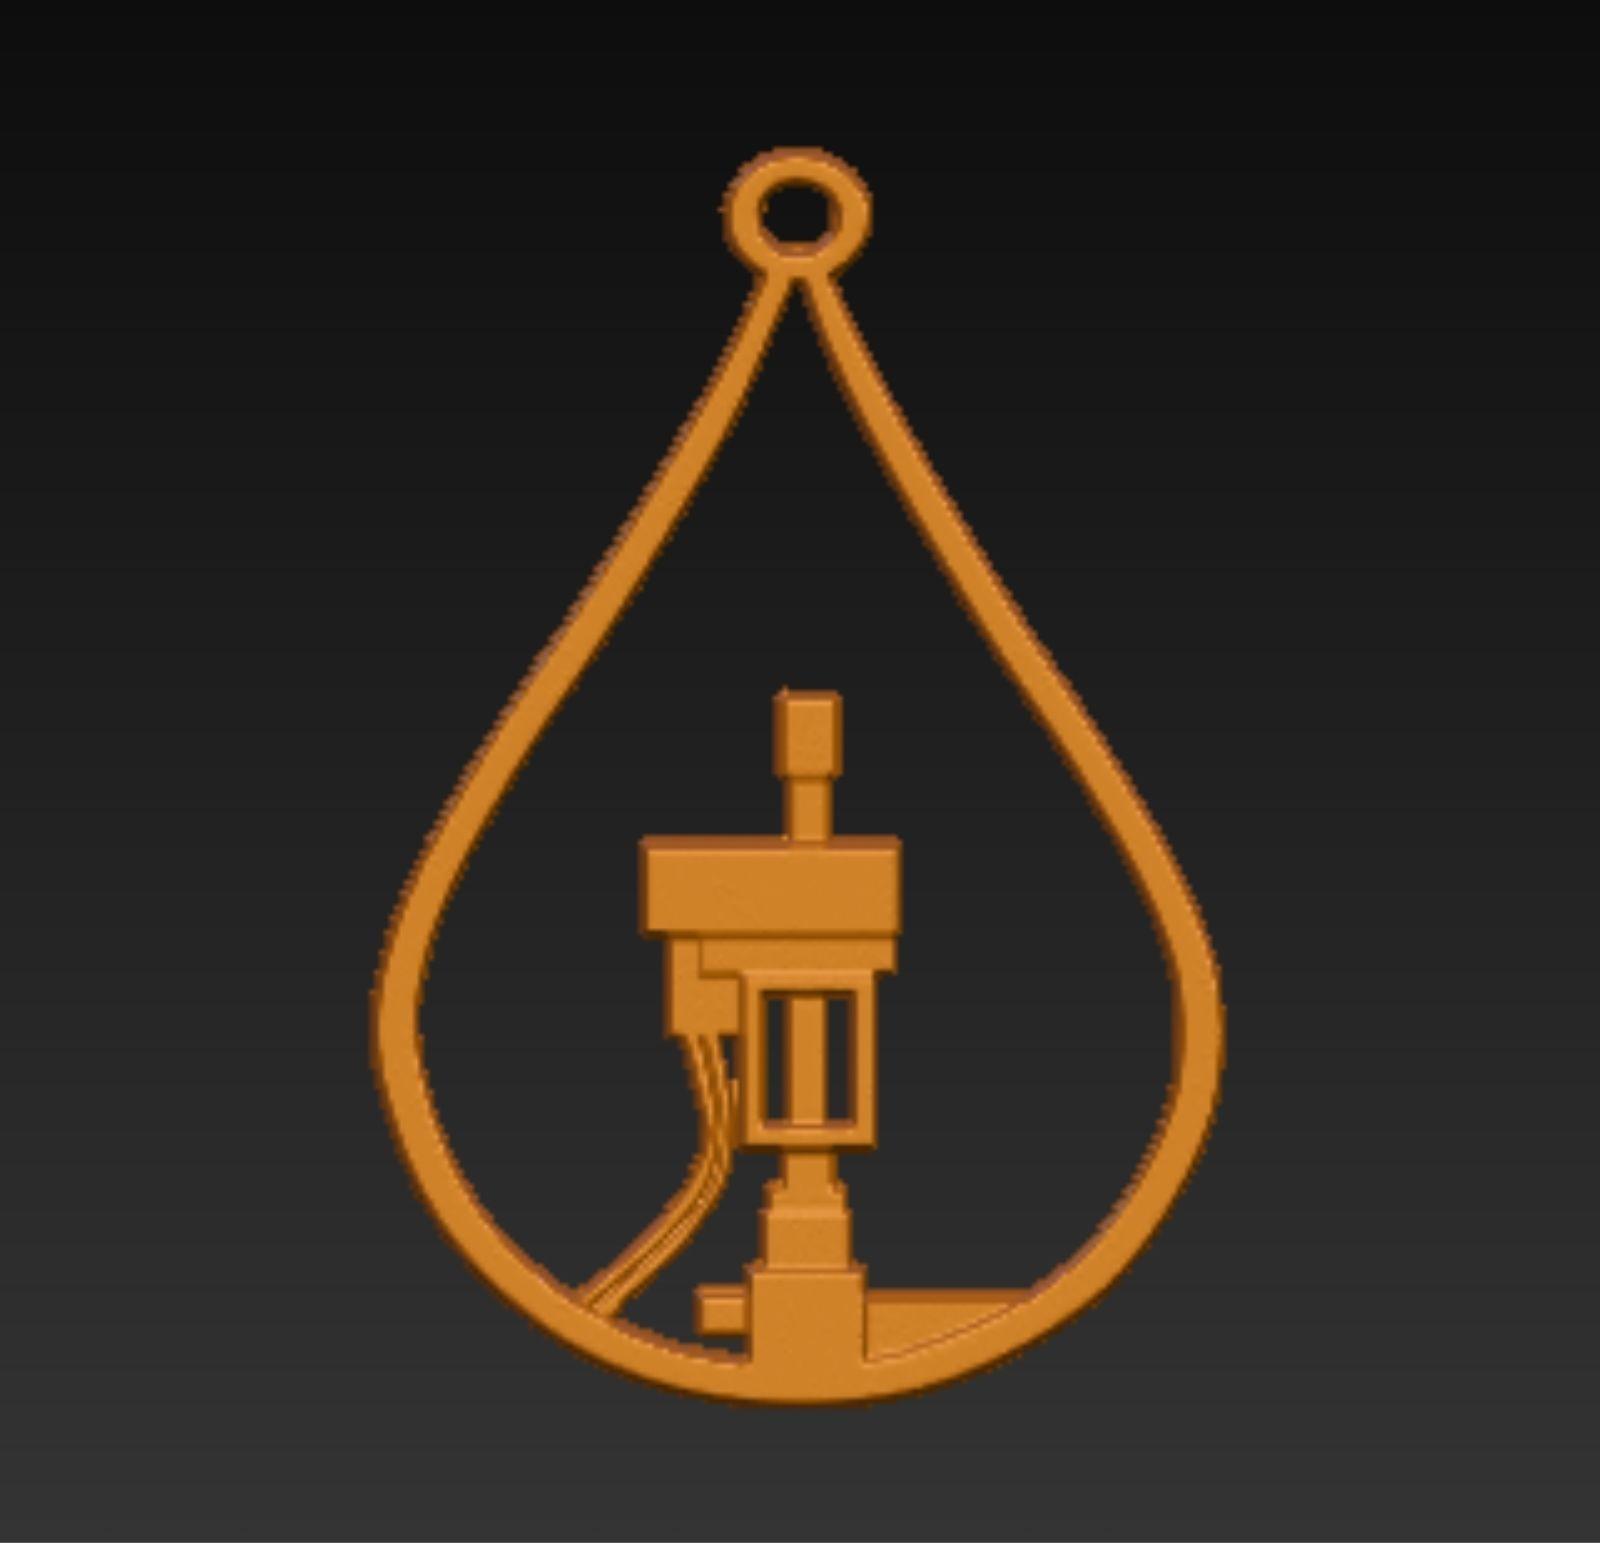 Oil Field Screw pump in droplet